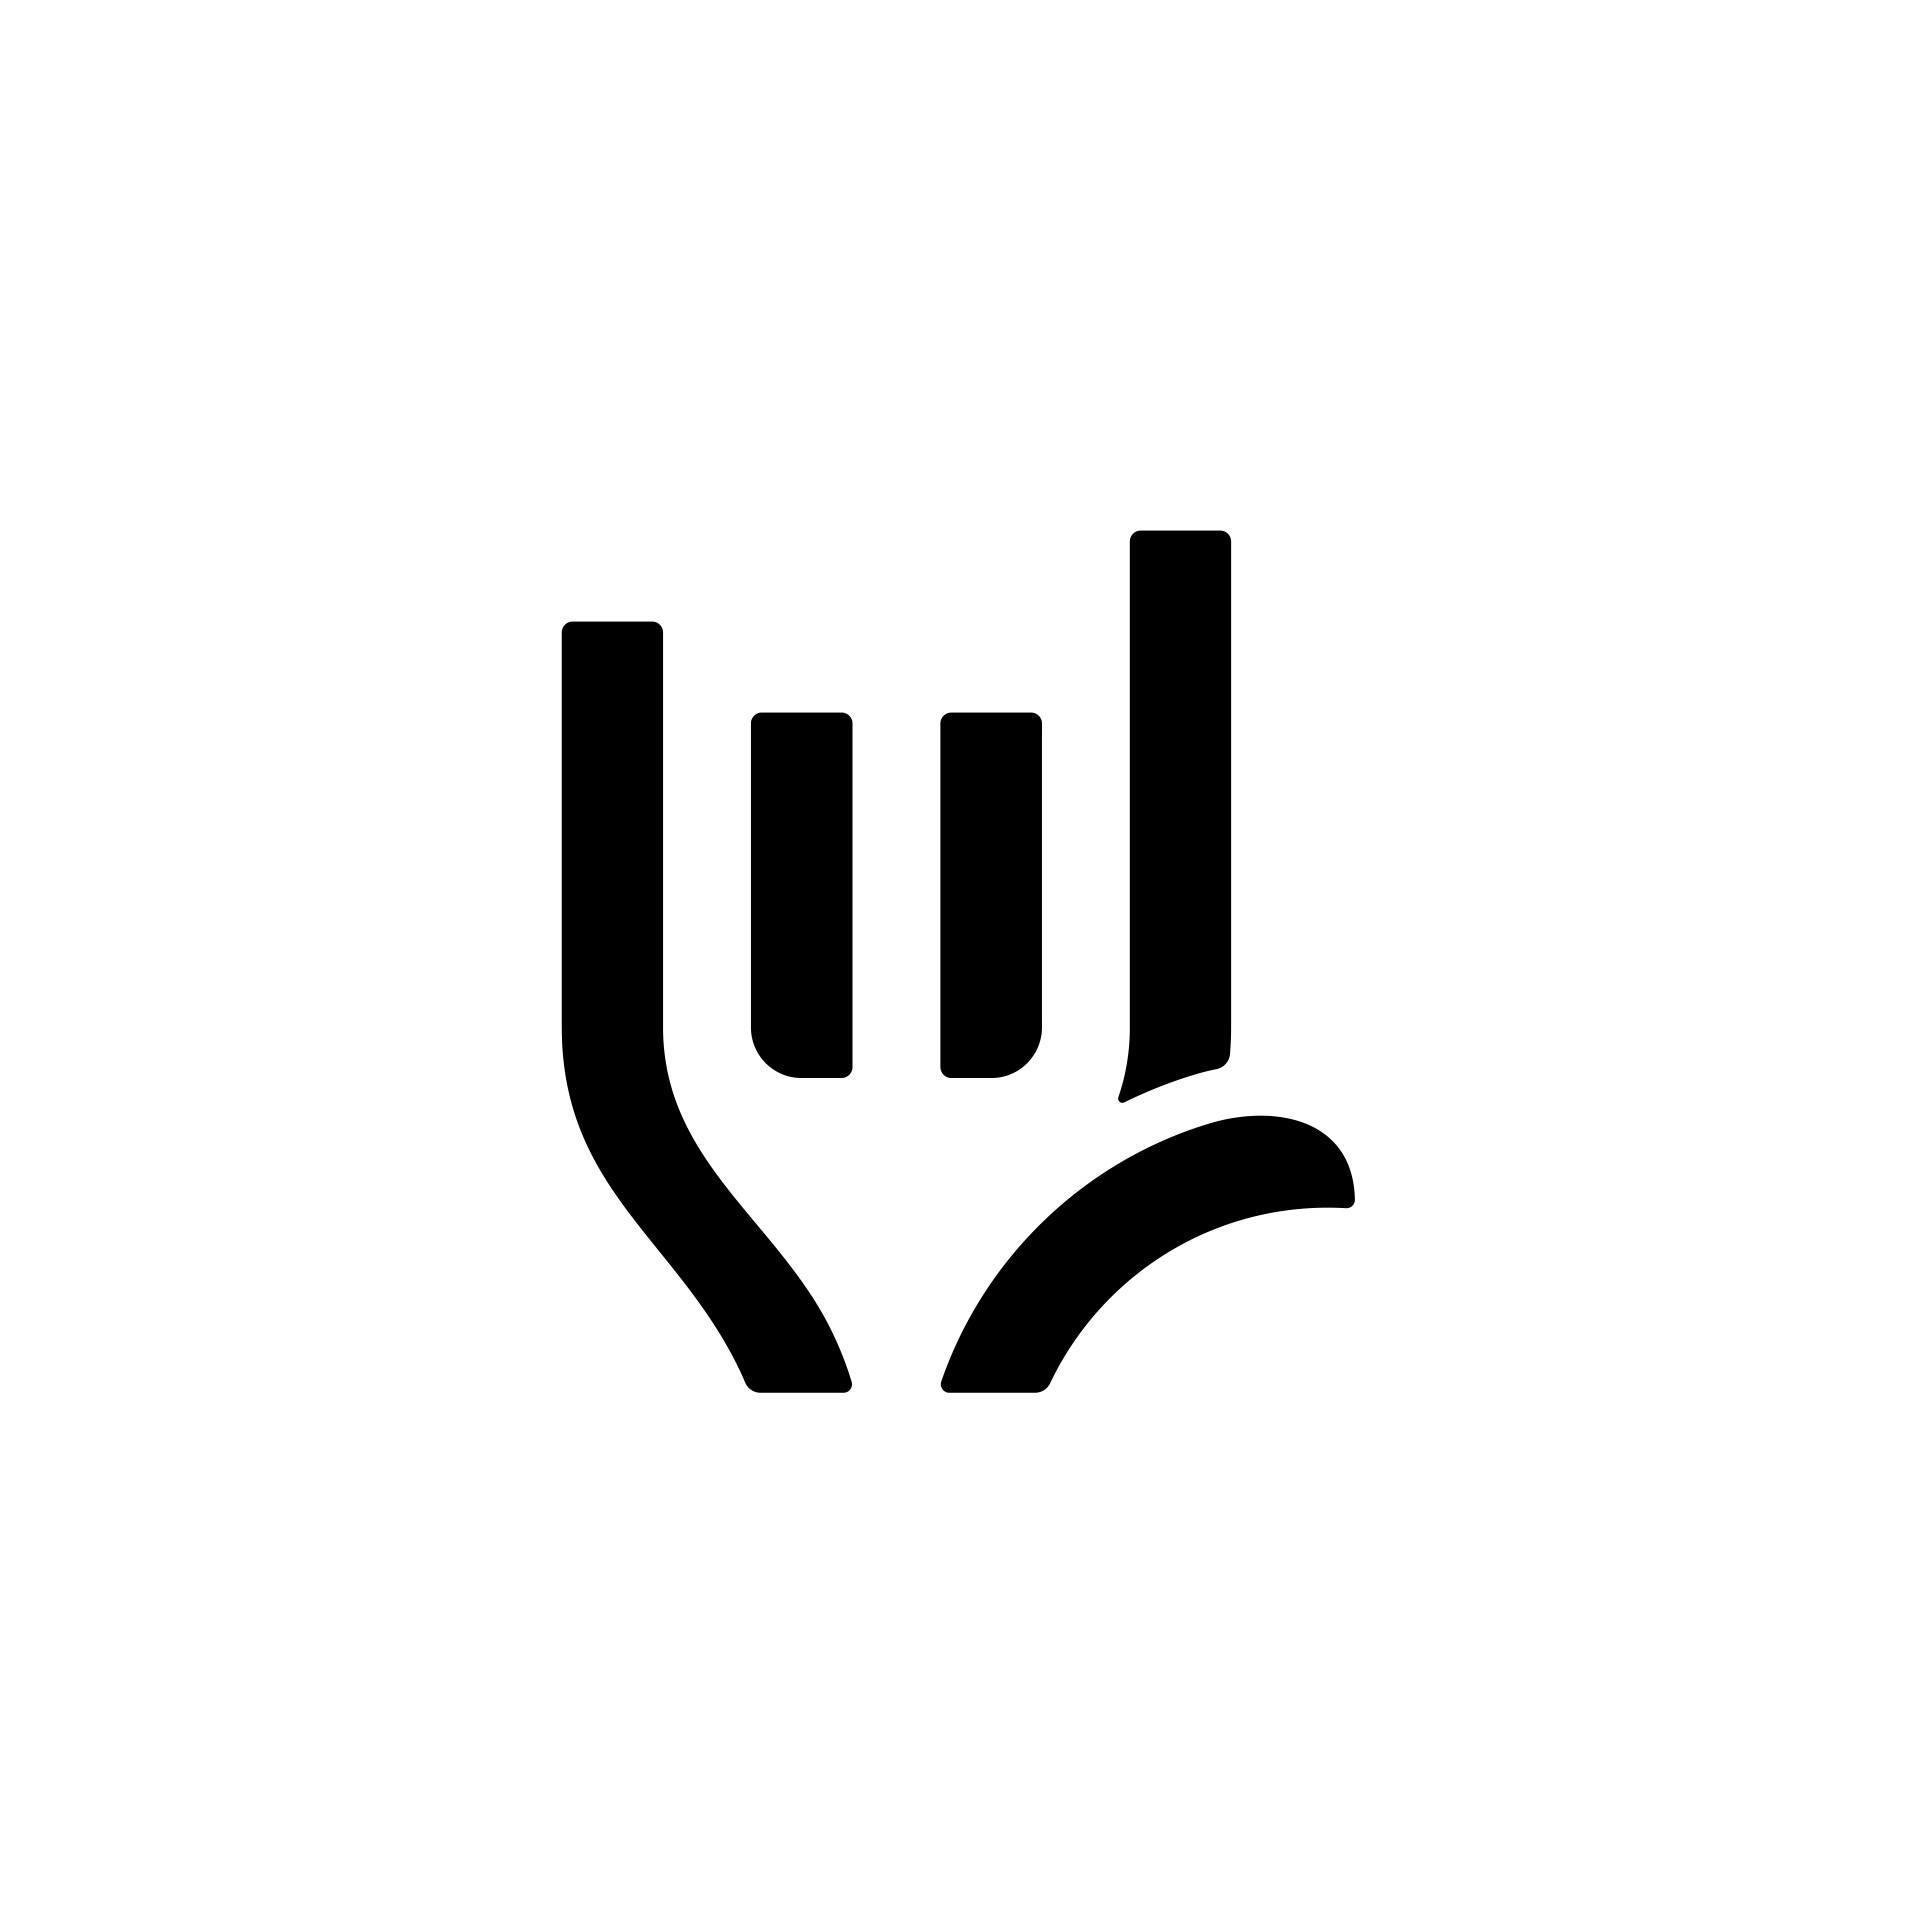 Design a fancy logo for our video menus app